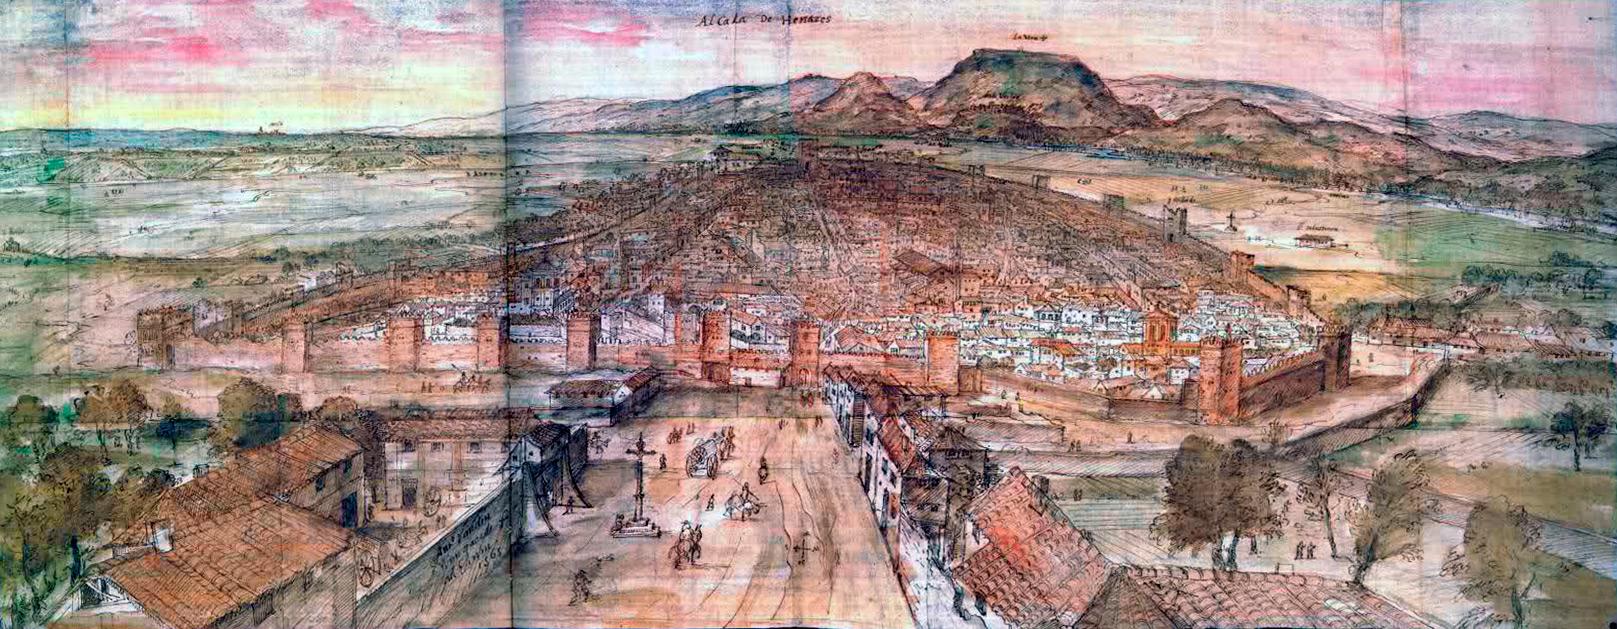 alcala de henares history